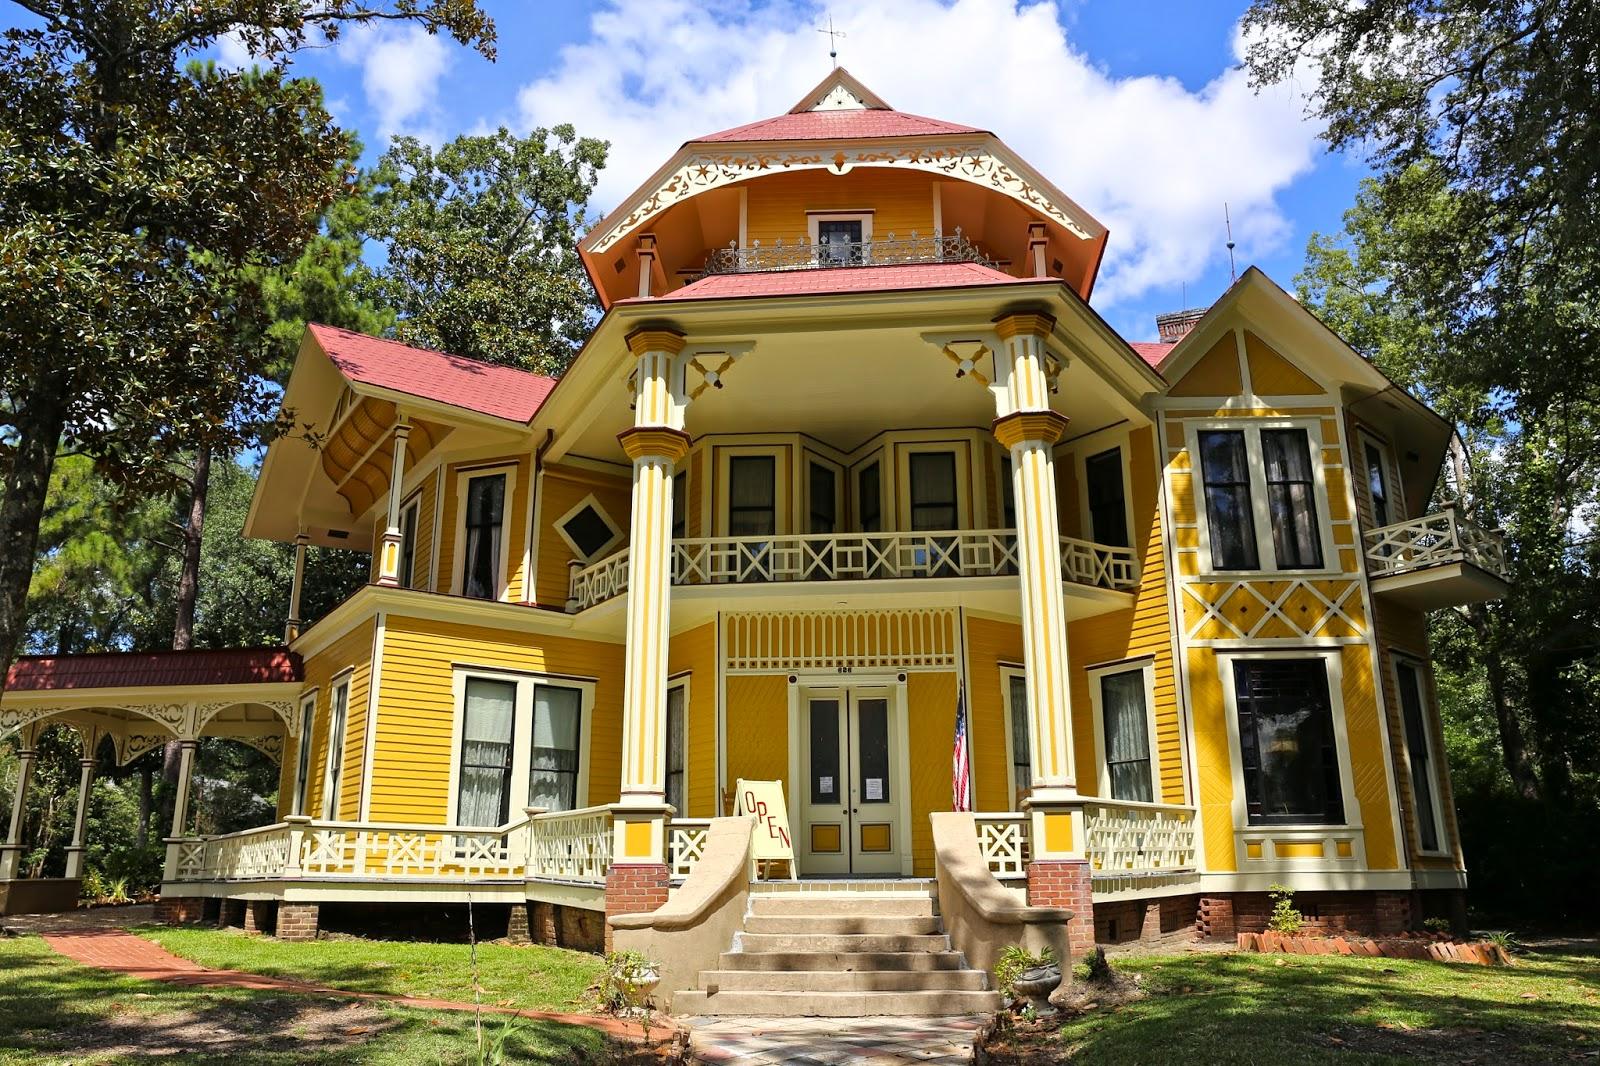 The Lapham-Patterson House